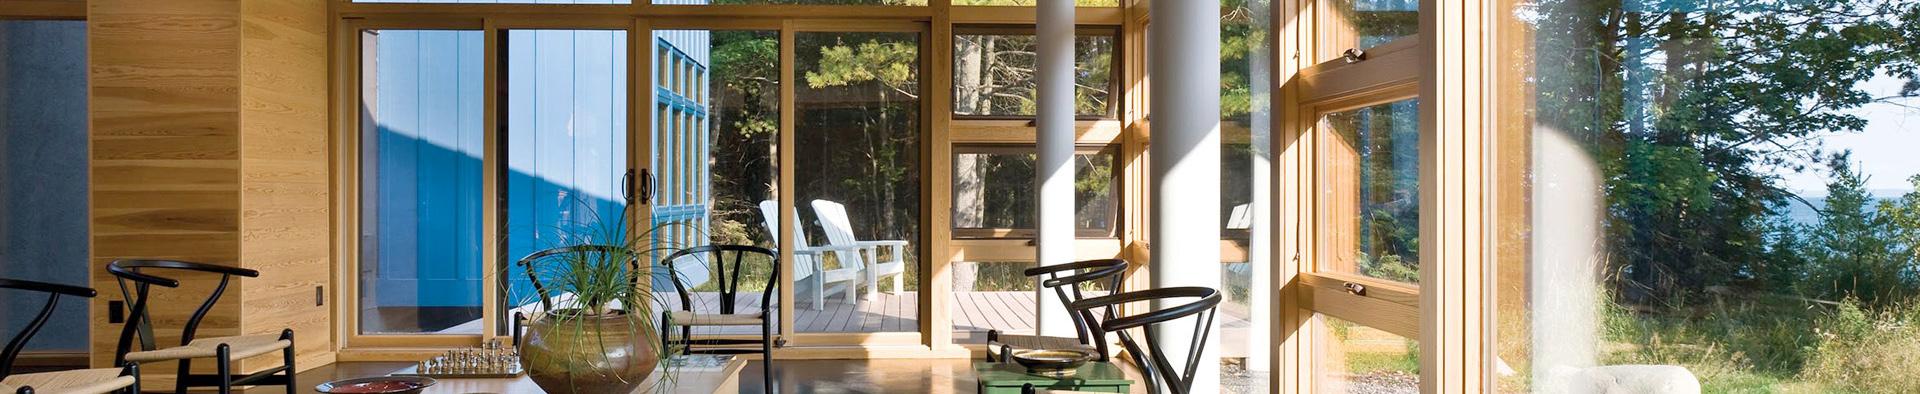 Andersen 400 200 Wood Windows Patio Doors Windowrama